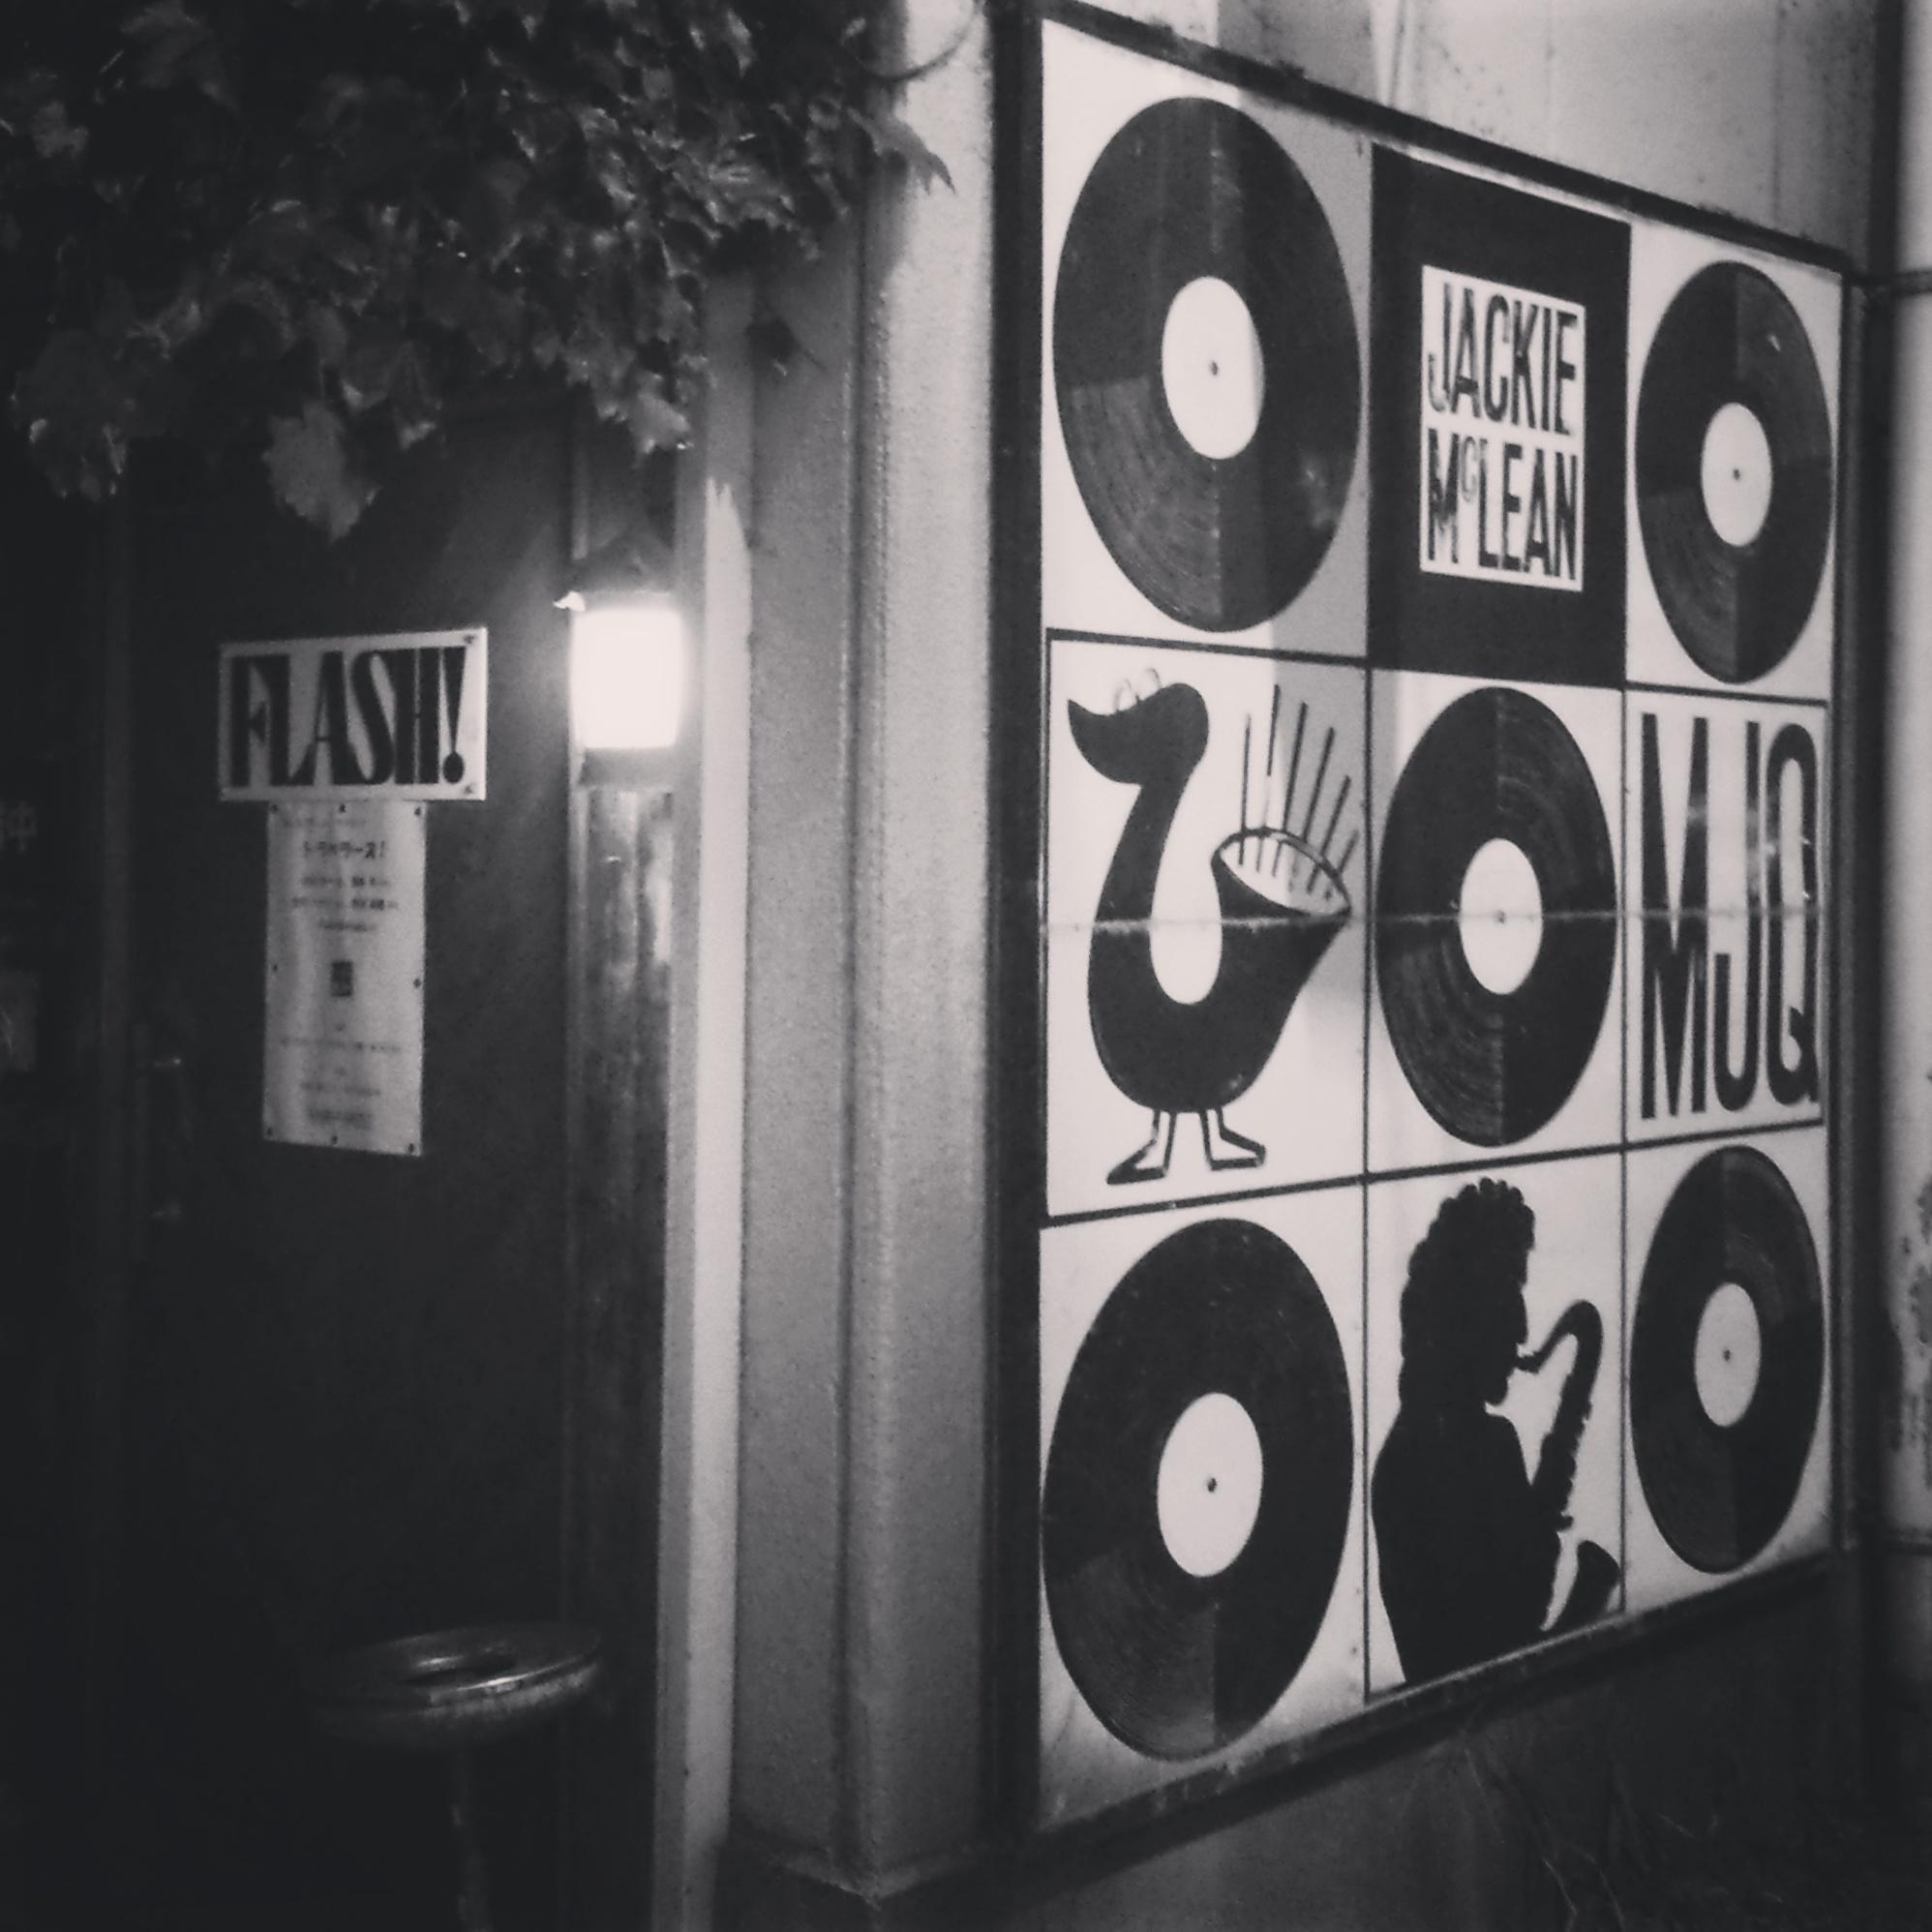 JazzFlashi.jpg